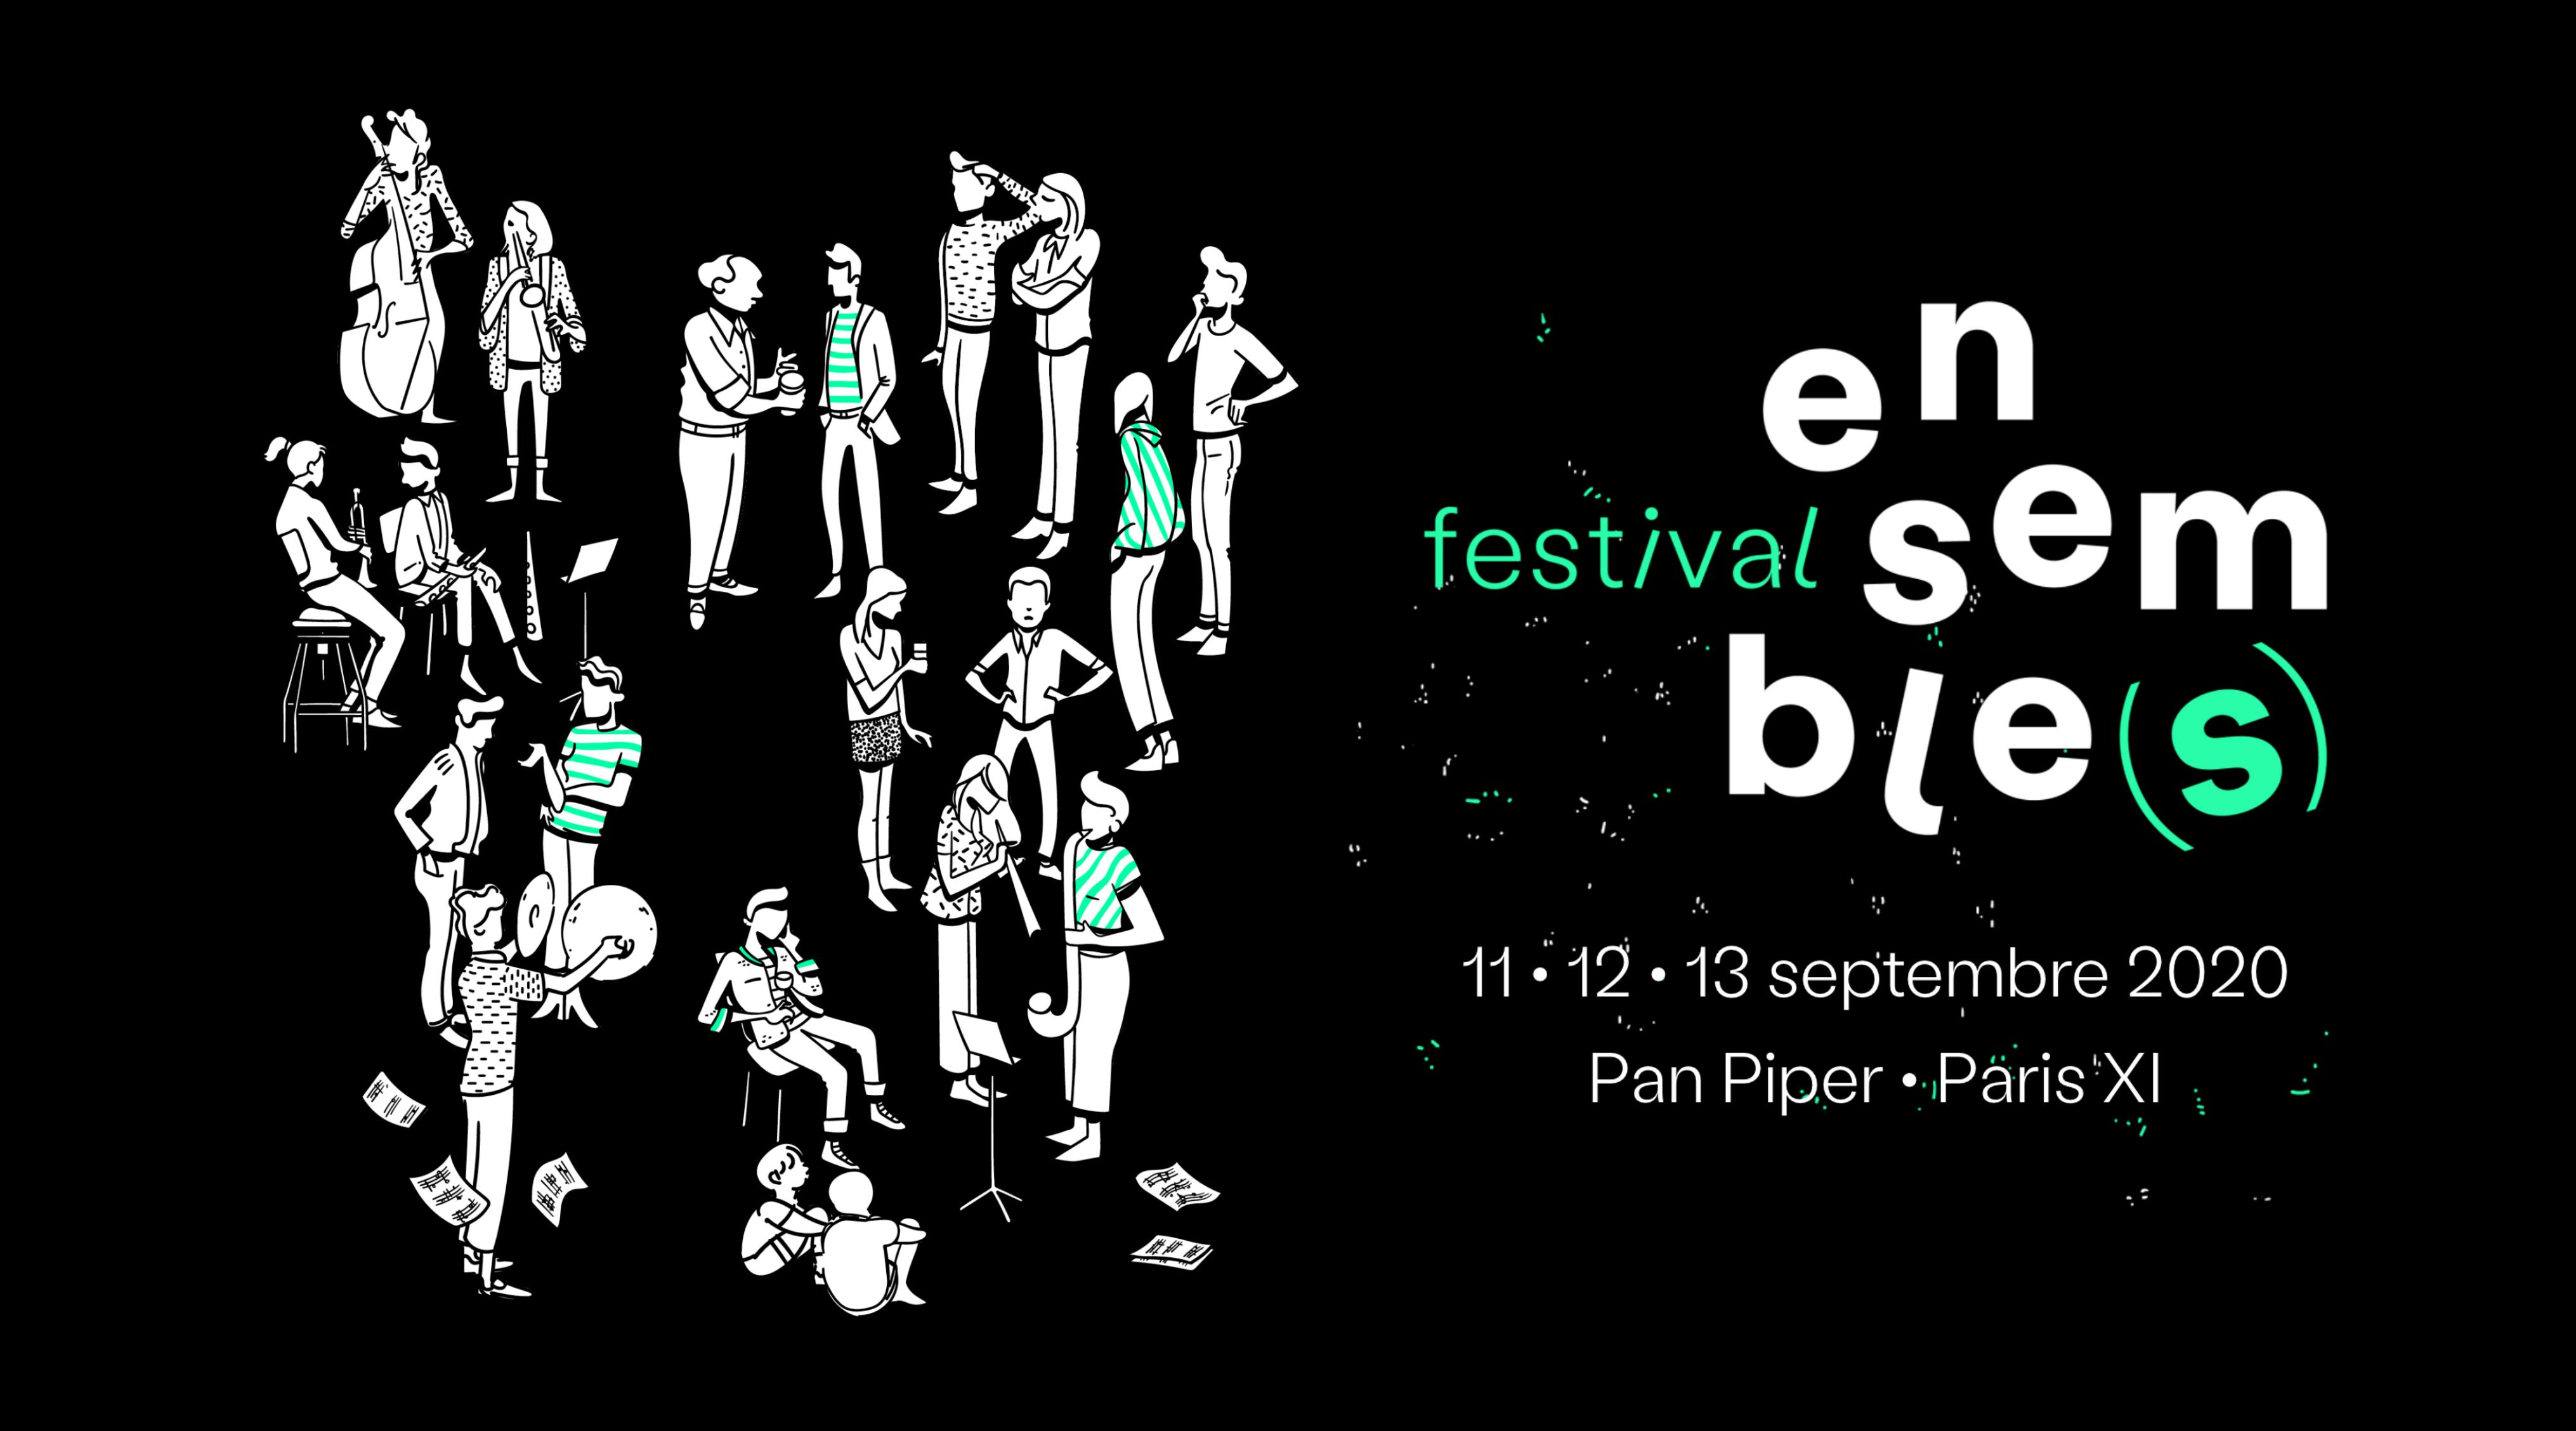 Festival Ensemble(s)